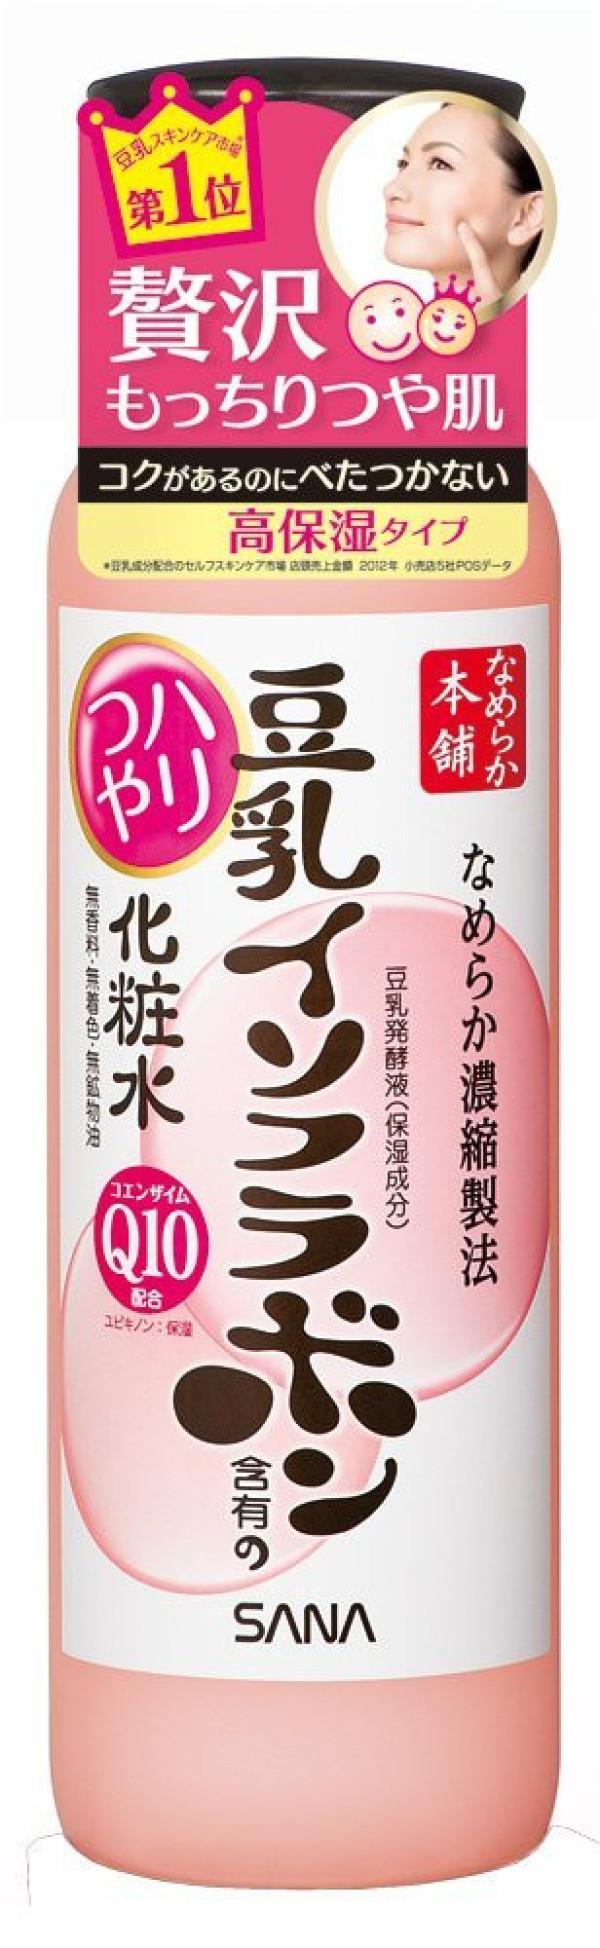 Лосьон с коэнзимом Q10 Sana Nameraka Honpo Haritsuya Skin Lotion N